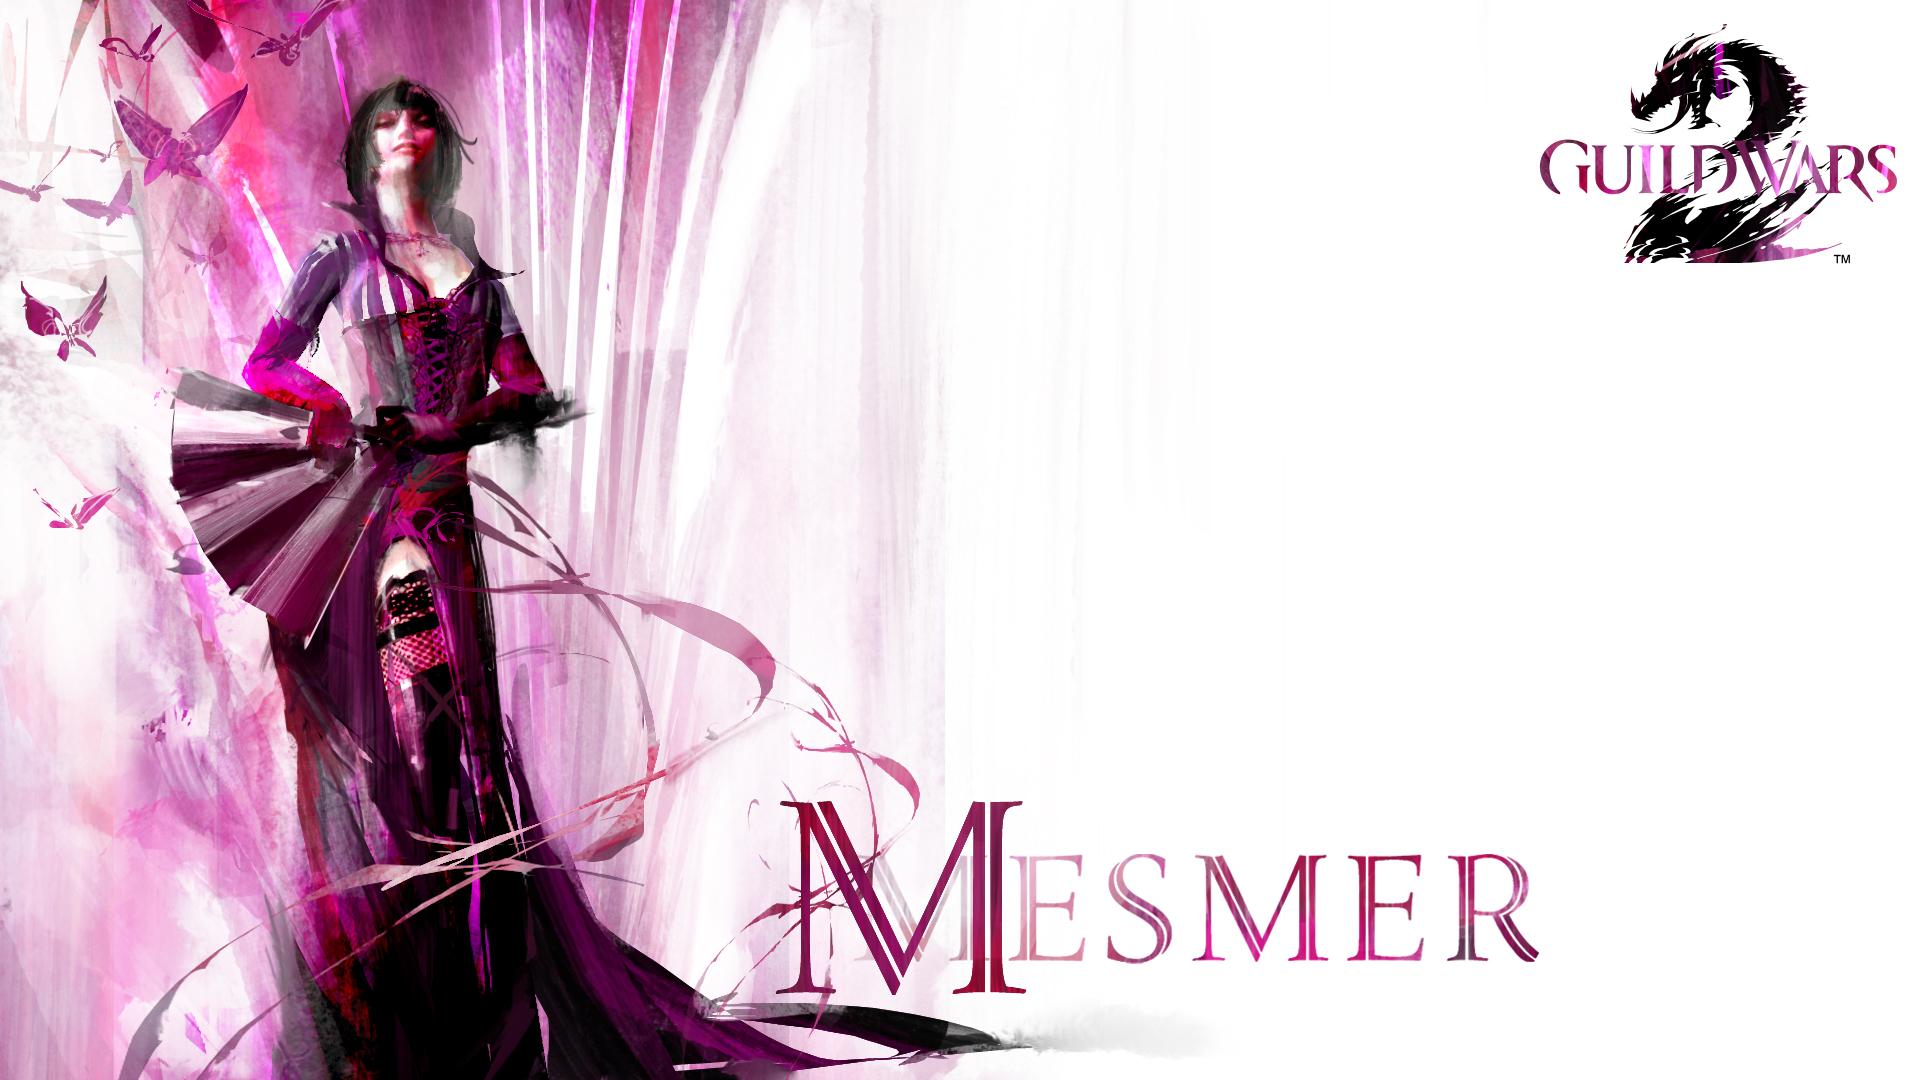 Mesmer | guildwars2. Com.